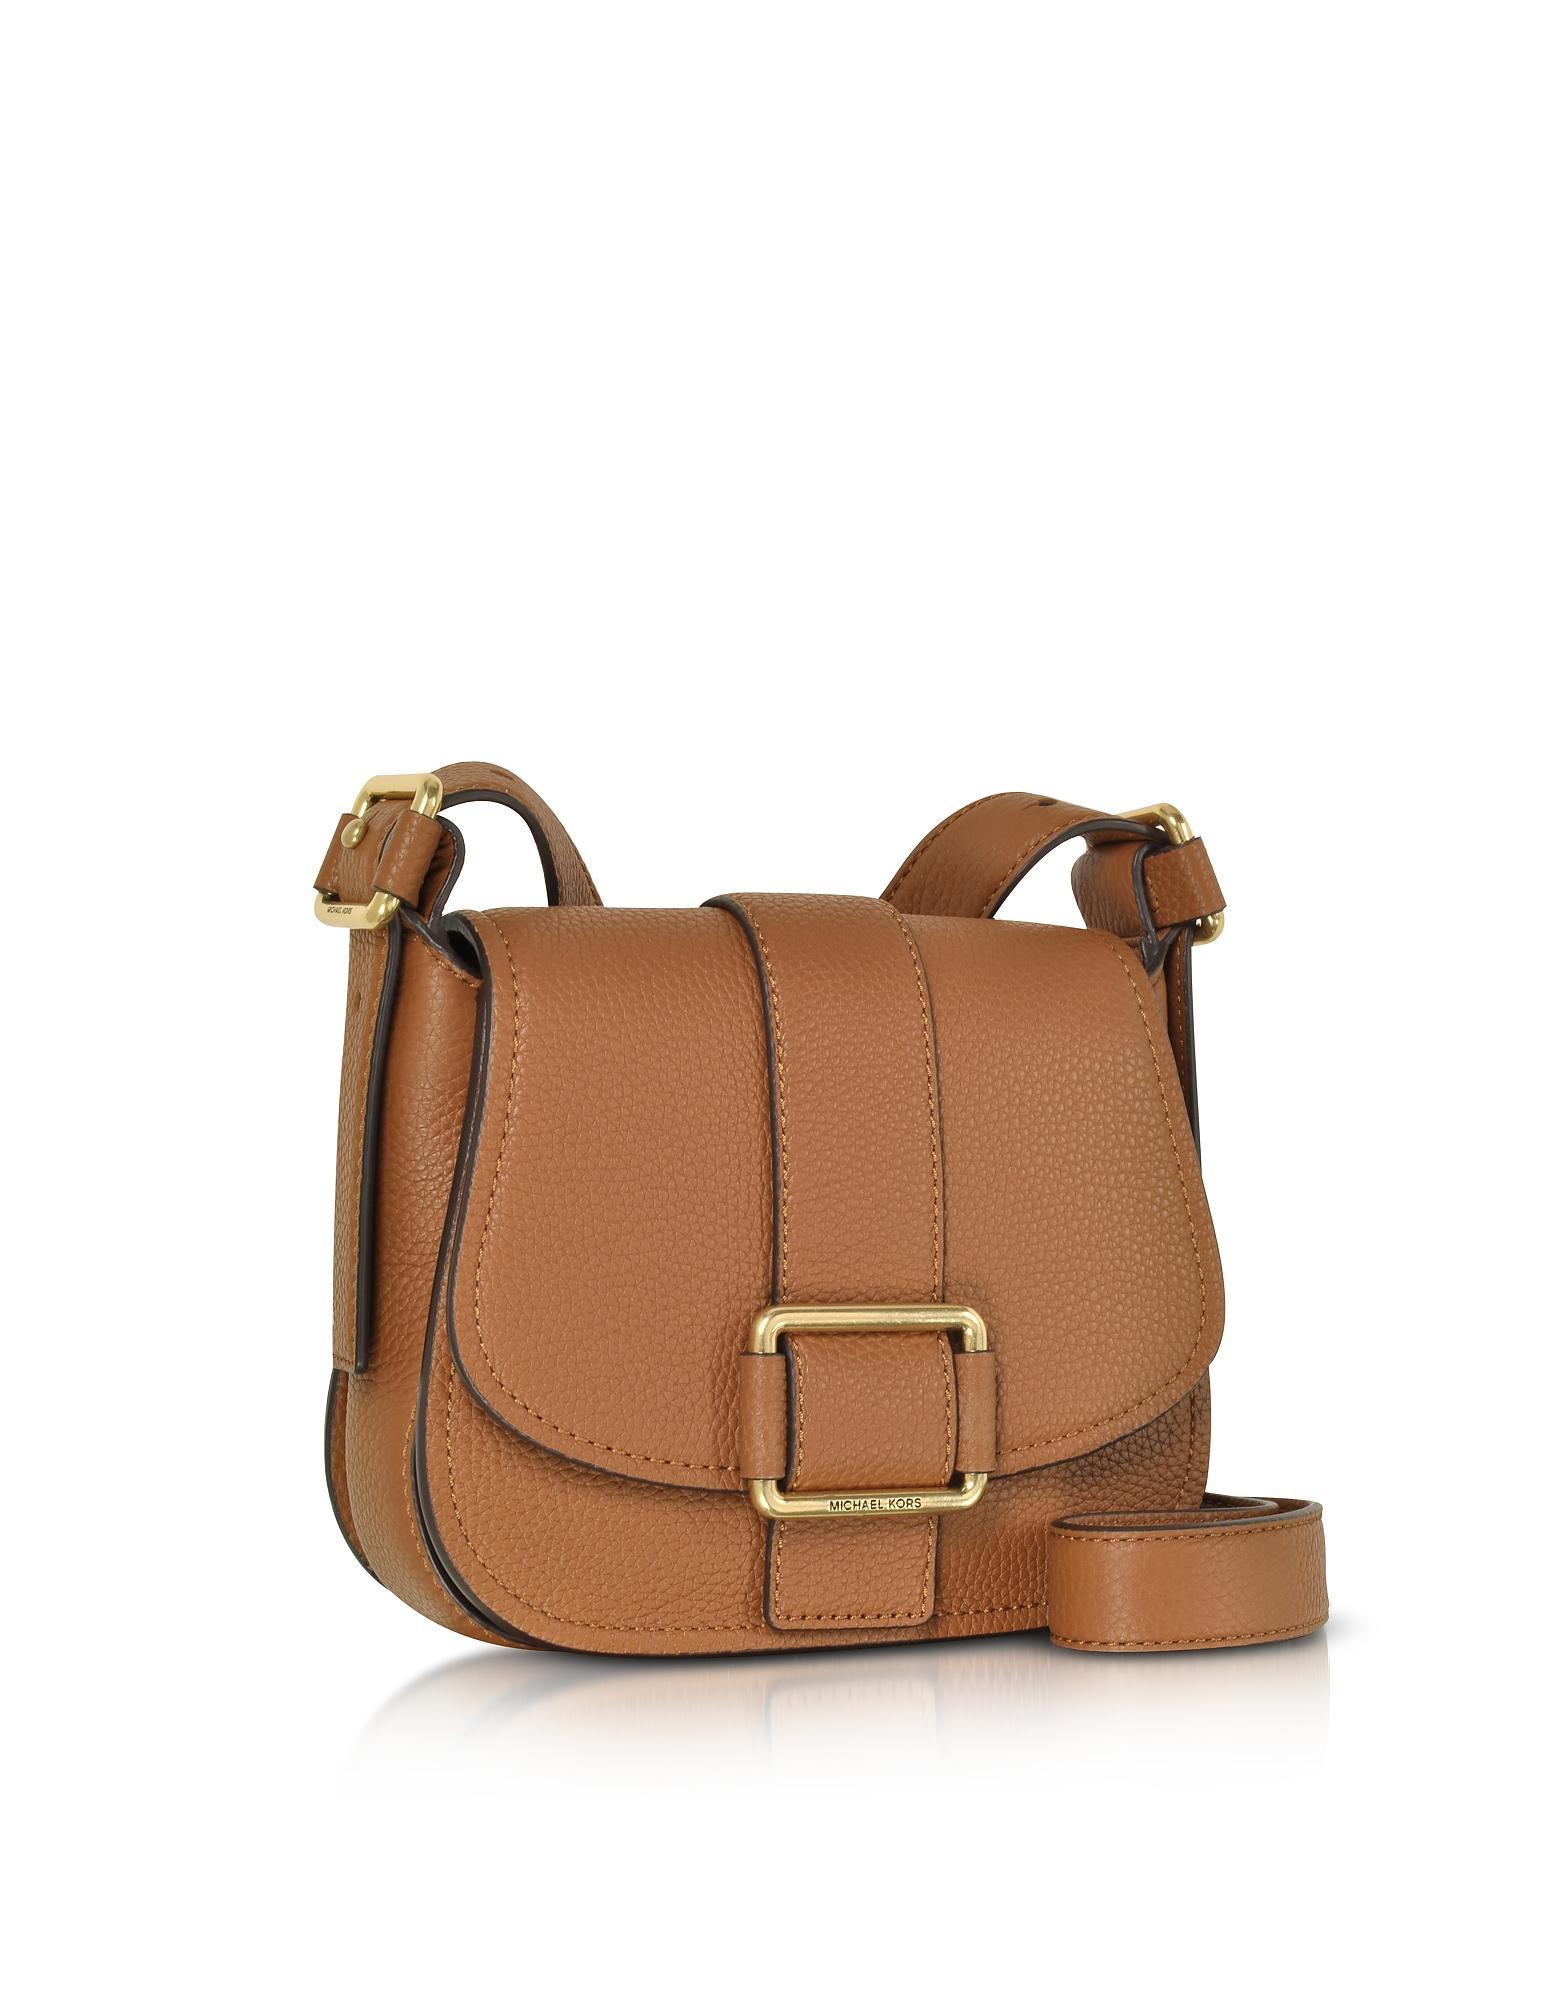 7f5ad6c907c3 Lyst - Michael Kors Maxine Medium Leather Saddle Bag in Brown